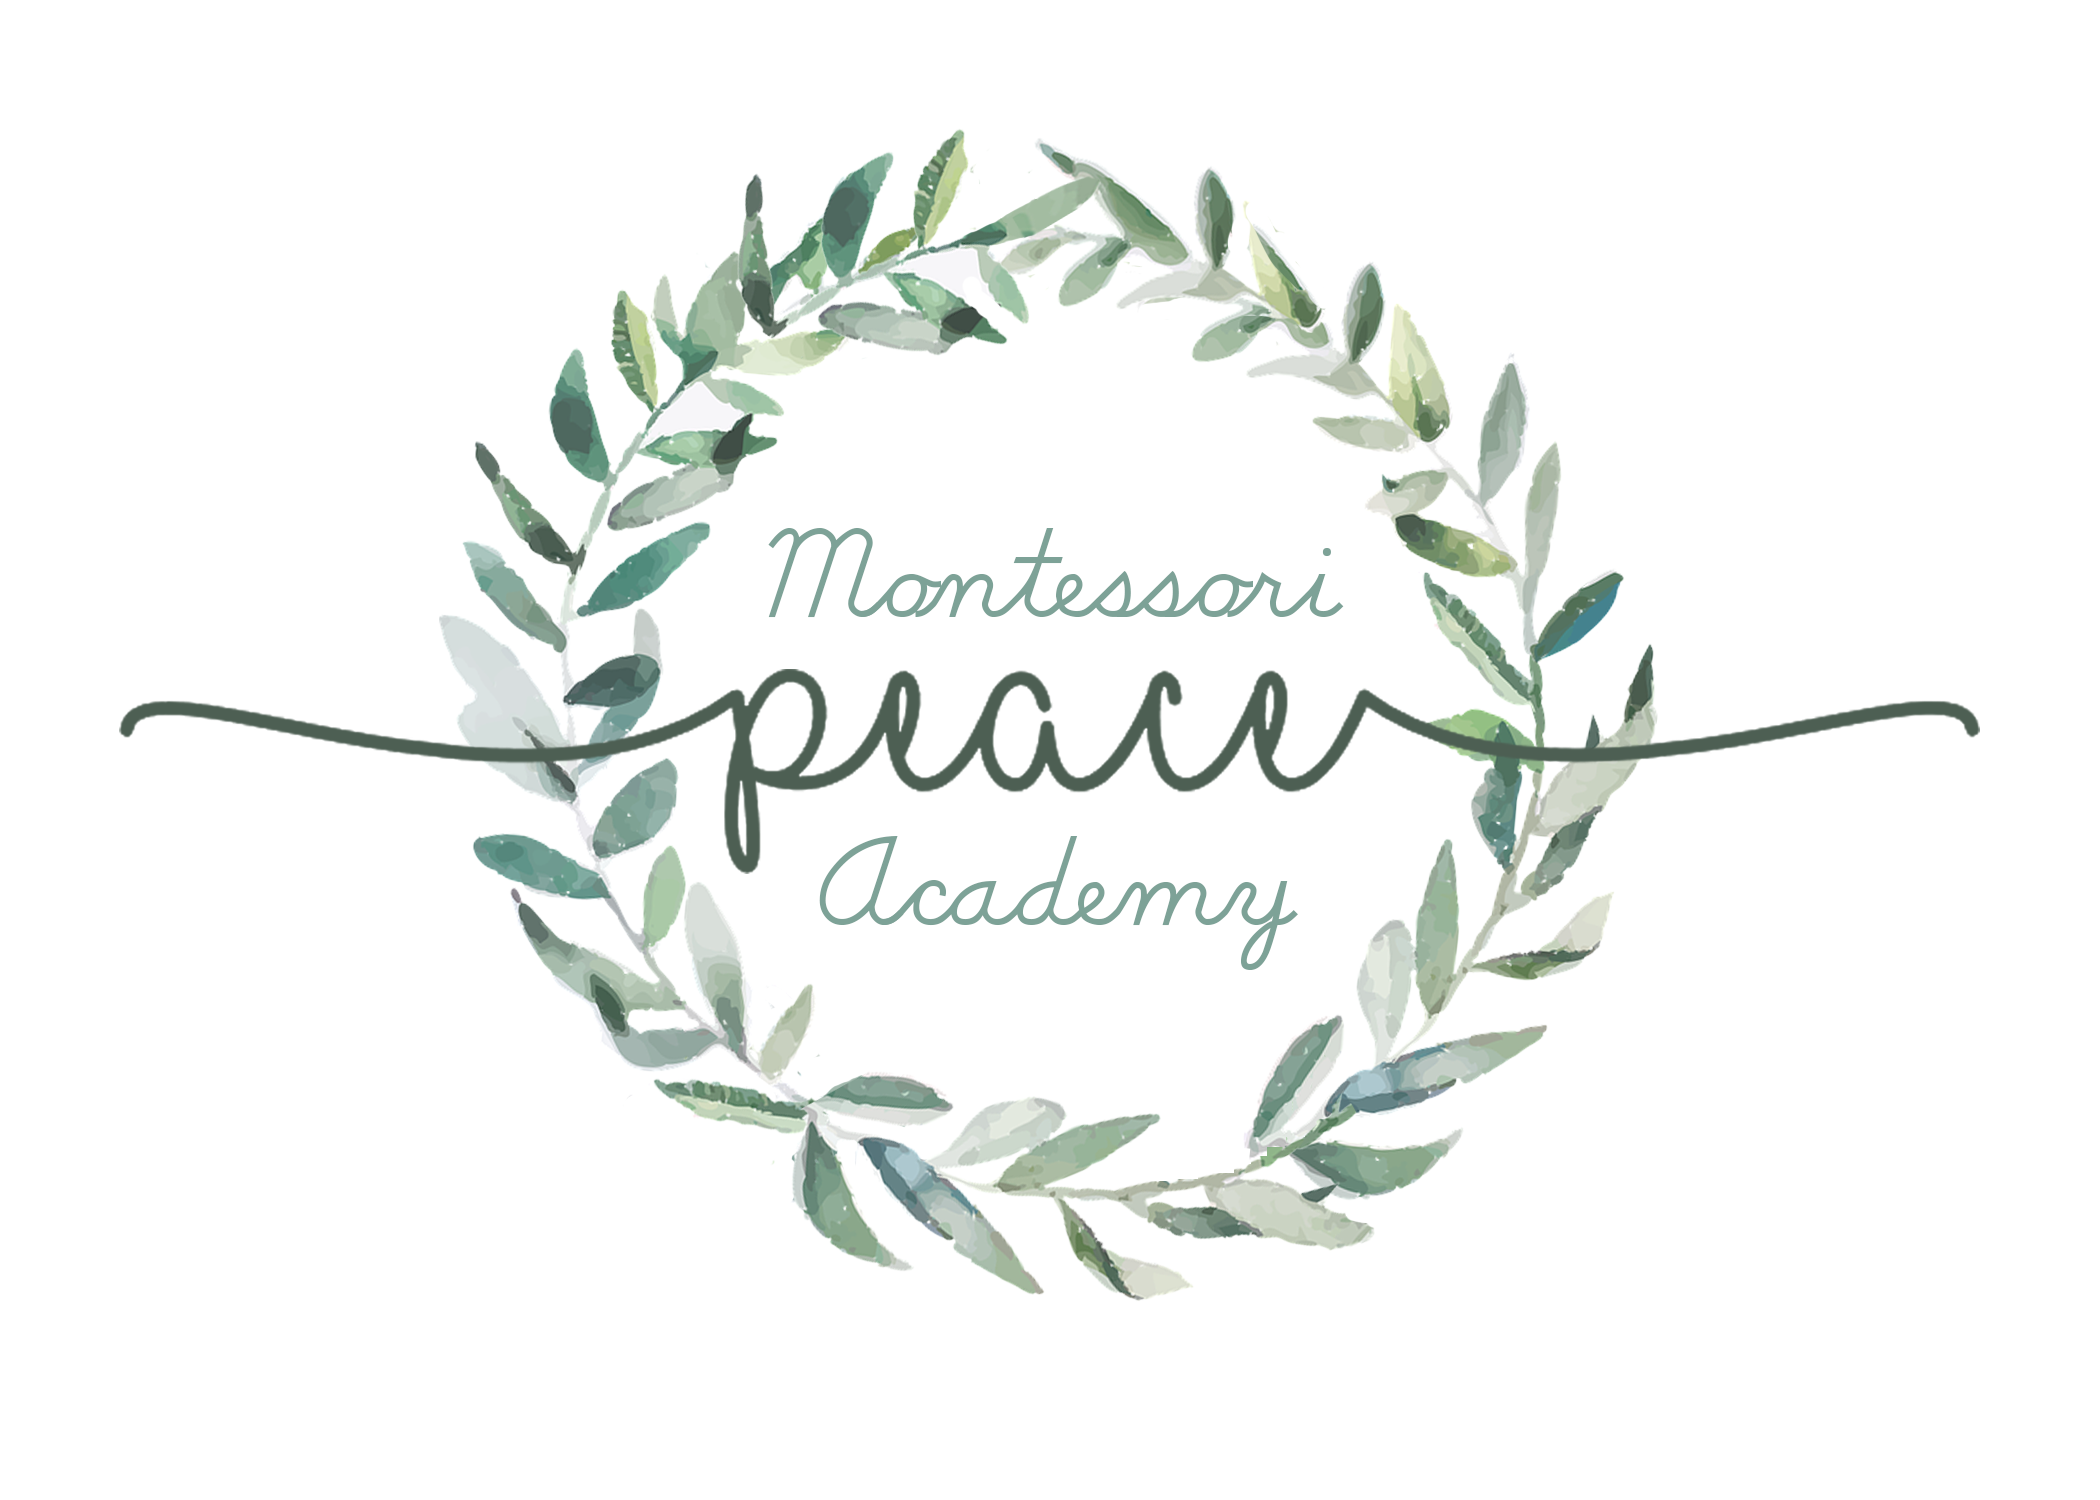 Montessori Peace Academy